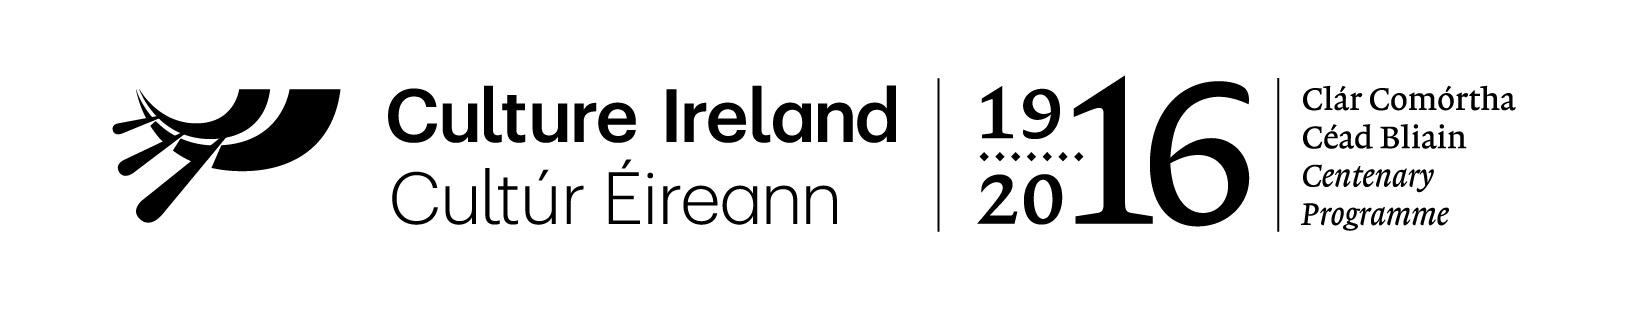 Culture_Ireland-2016_Black